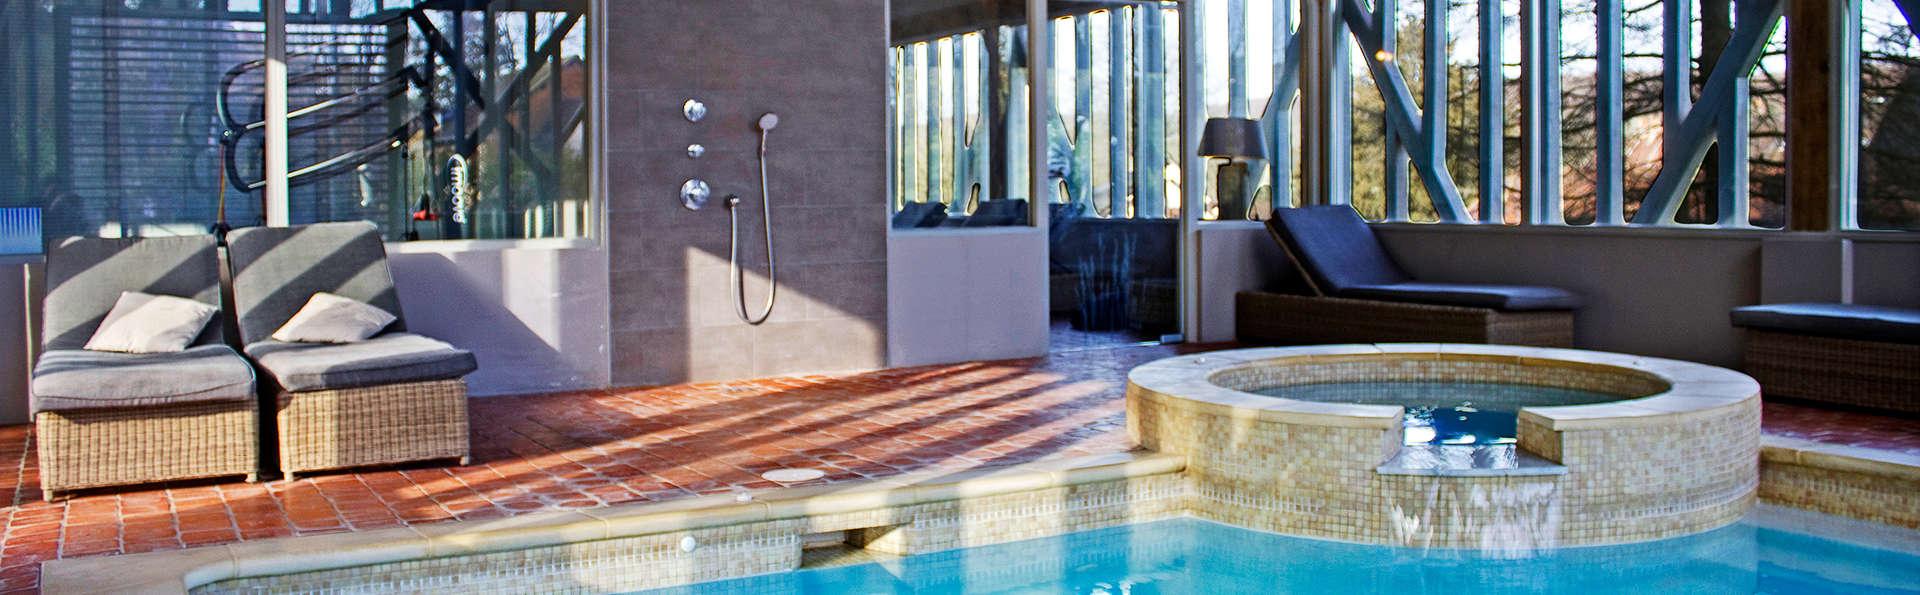 Hôtel La Licorne & Spa - EDIT_spa.jpg